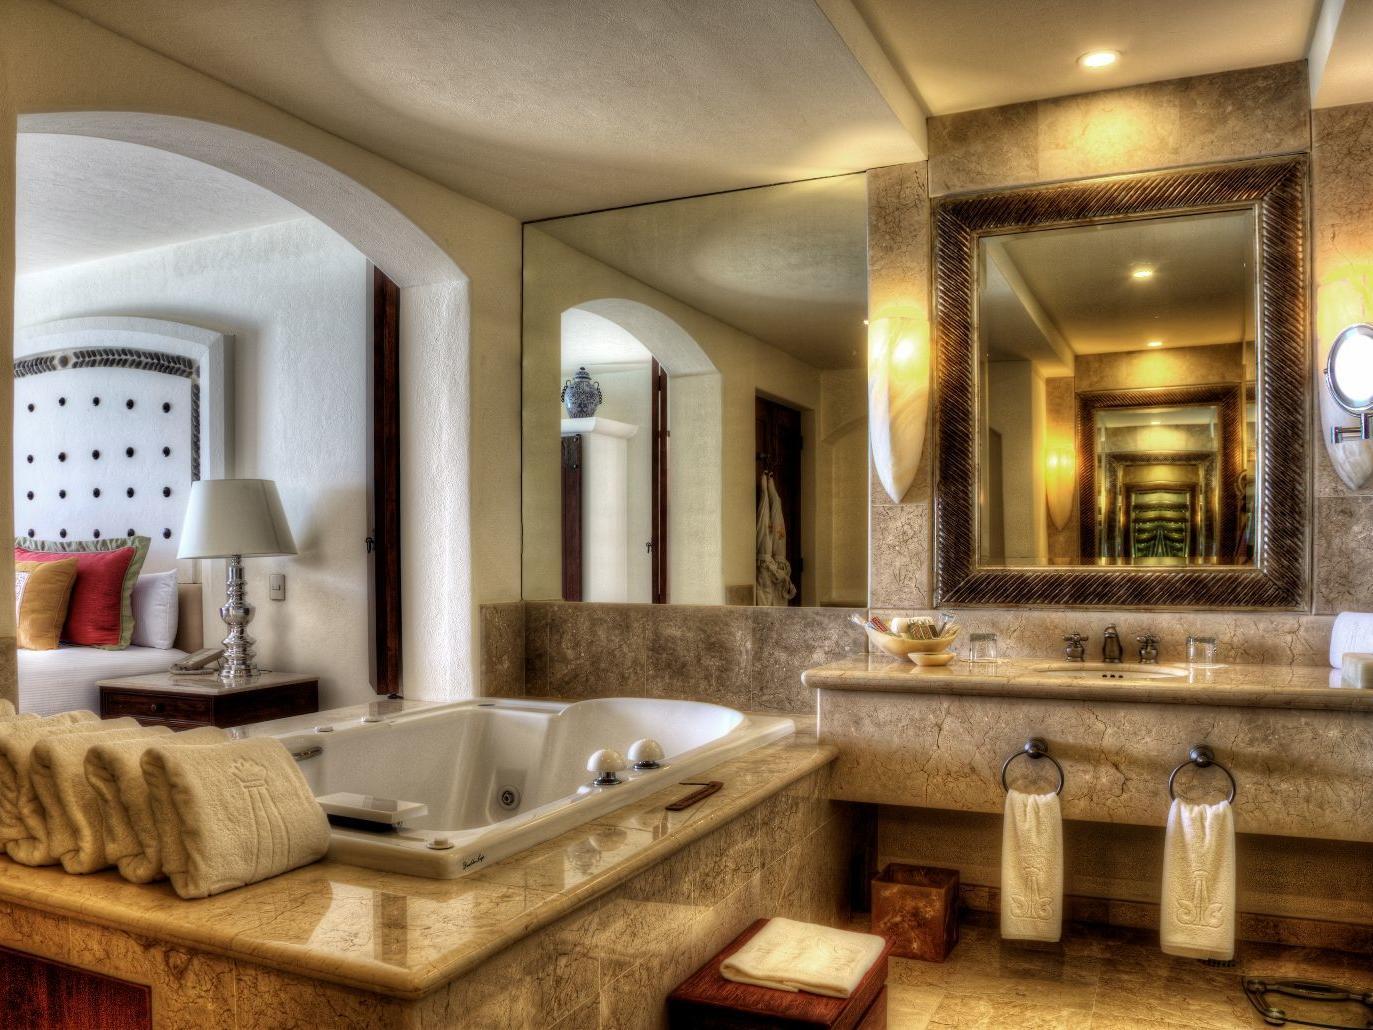 A tub and sink in a bathroom - Marquis Los Cabos